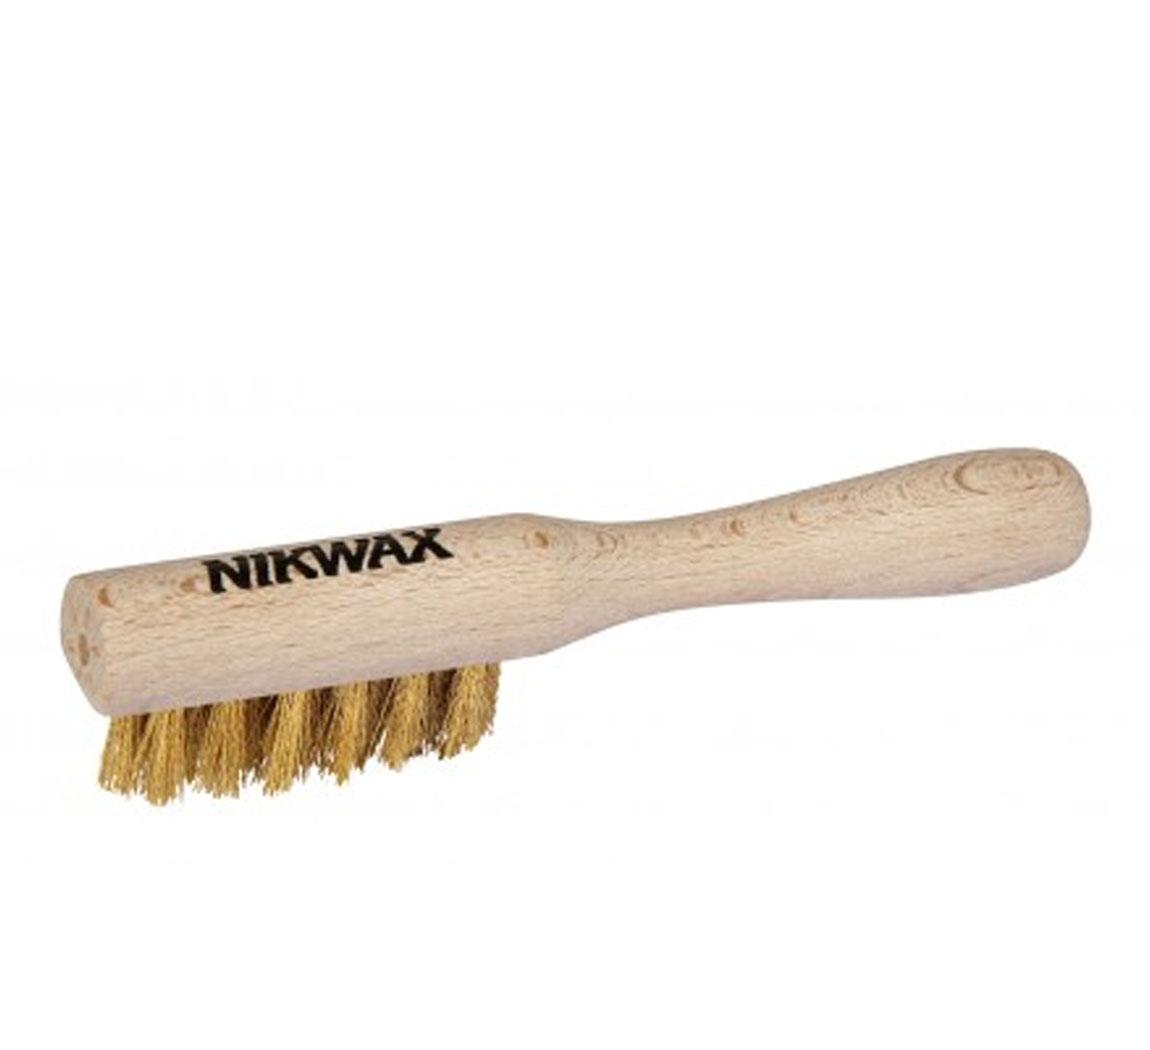 Brosse Nikwax pour chaussure en daim Brosse à daim Nikwak